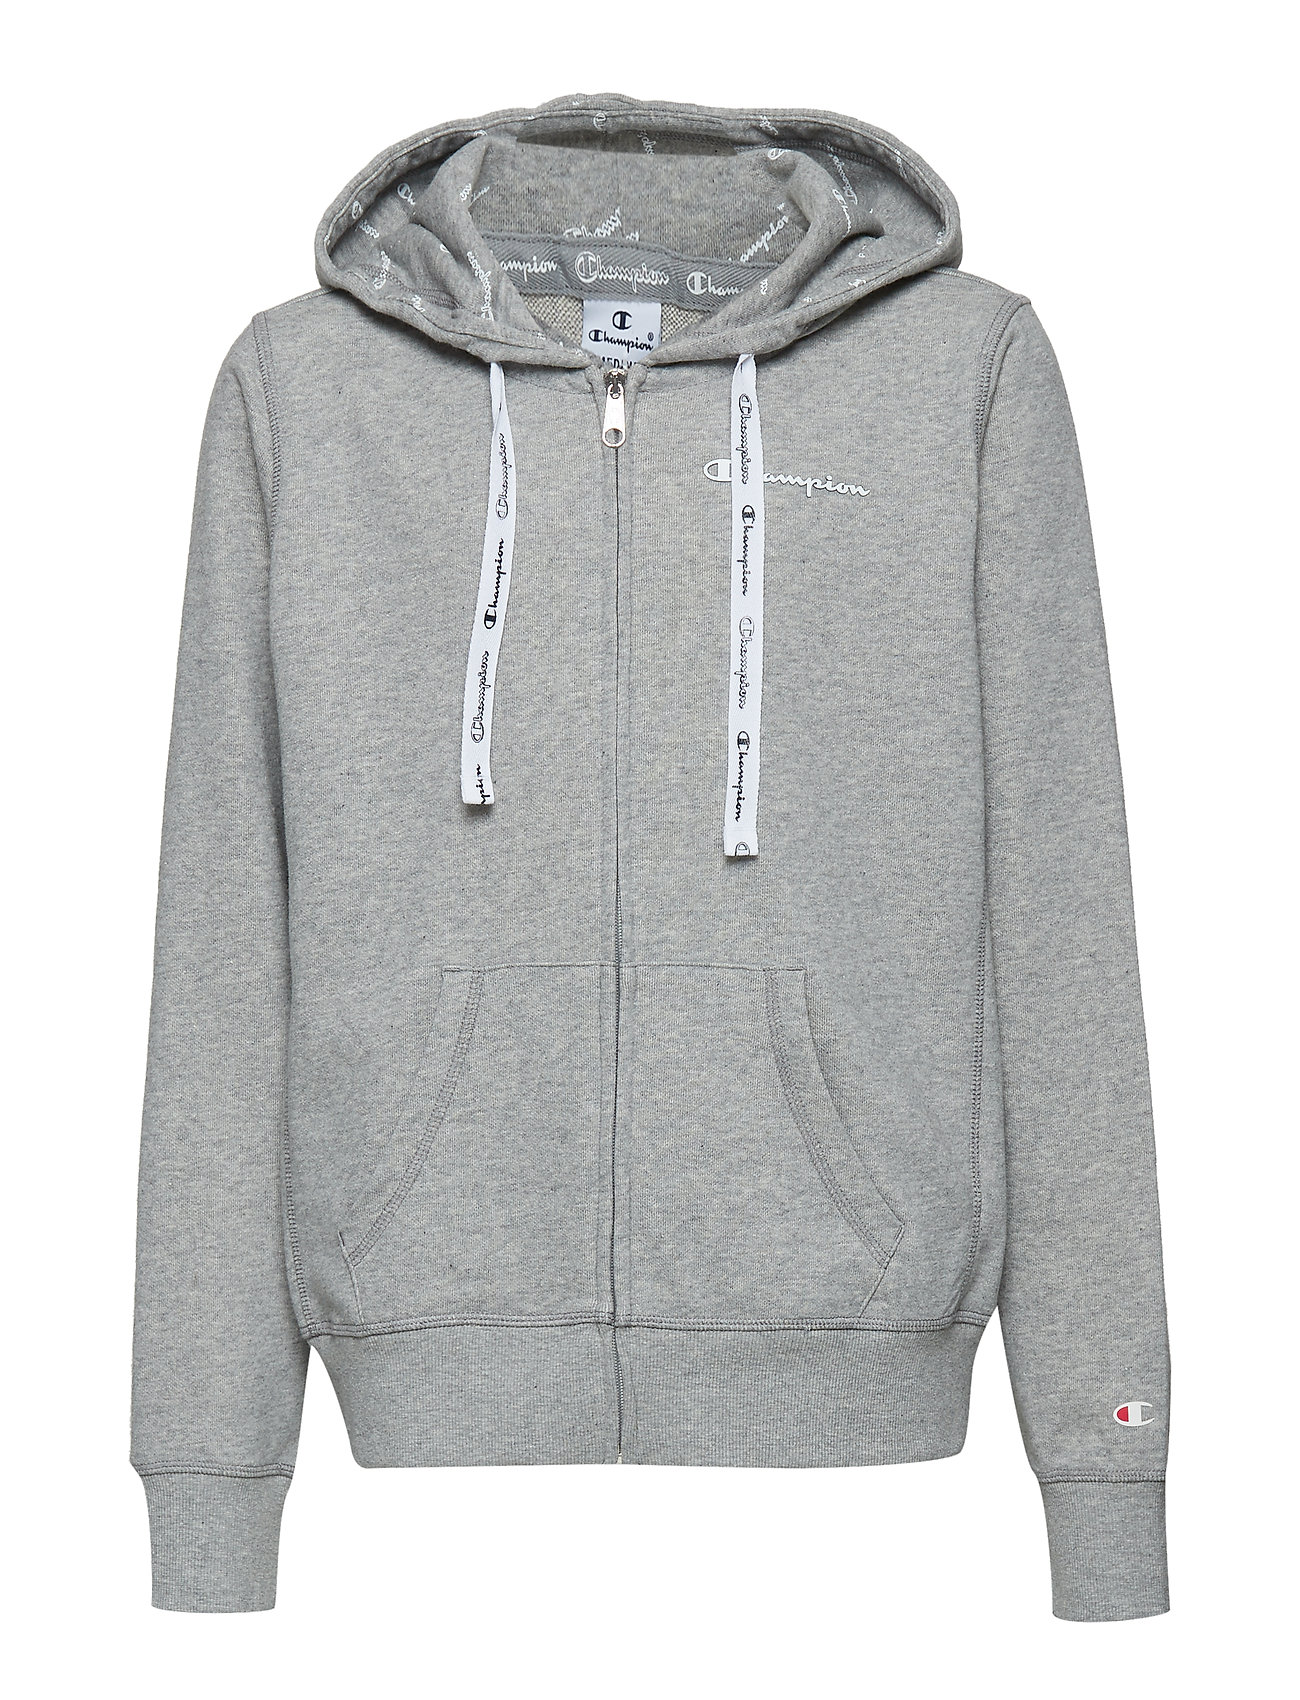 Champion Hooded Full Zip Sweatshirt - GRAY MELANGE LIGHT